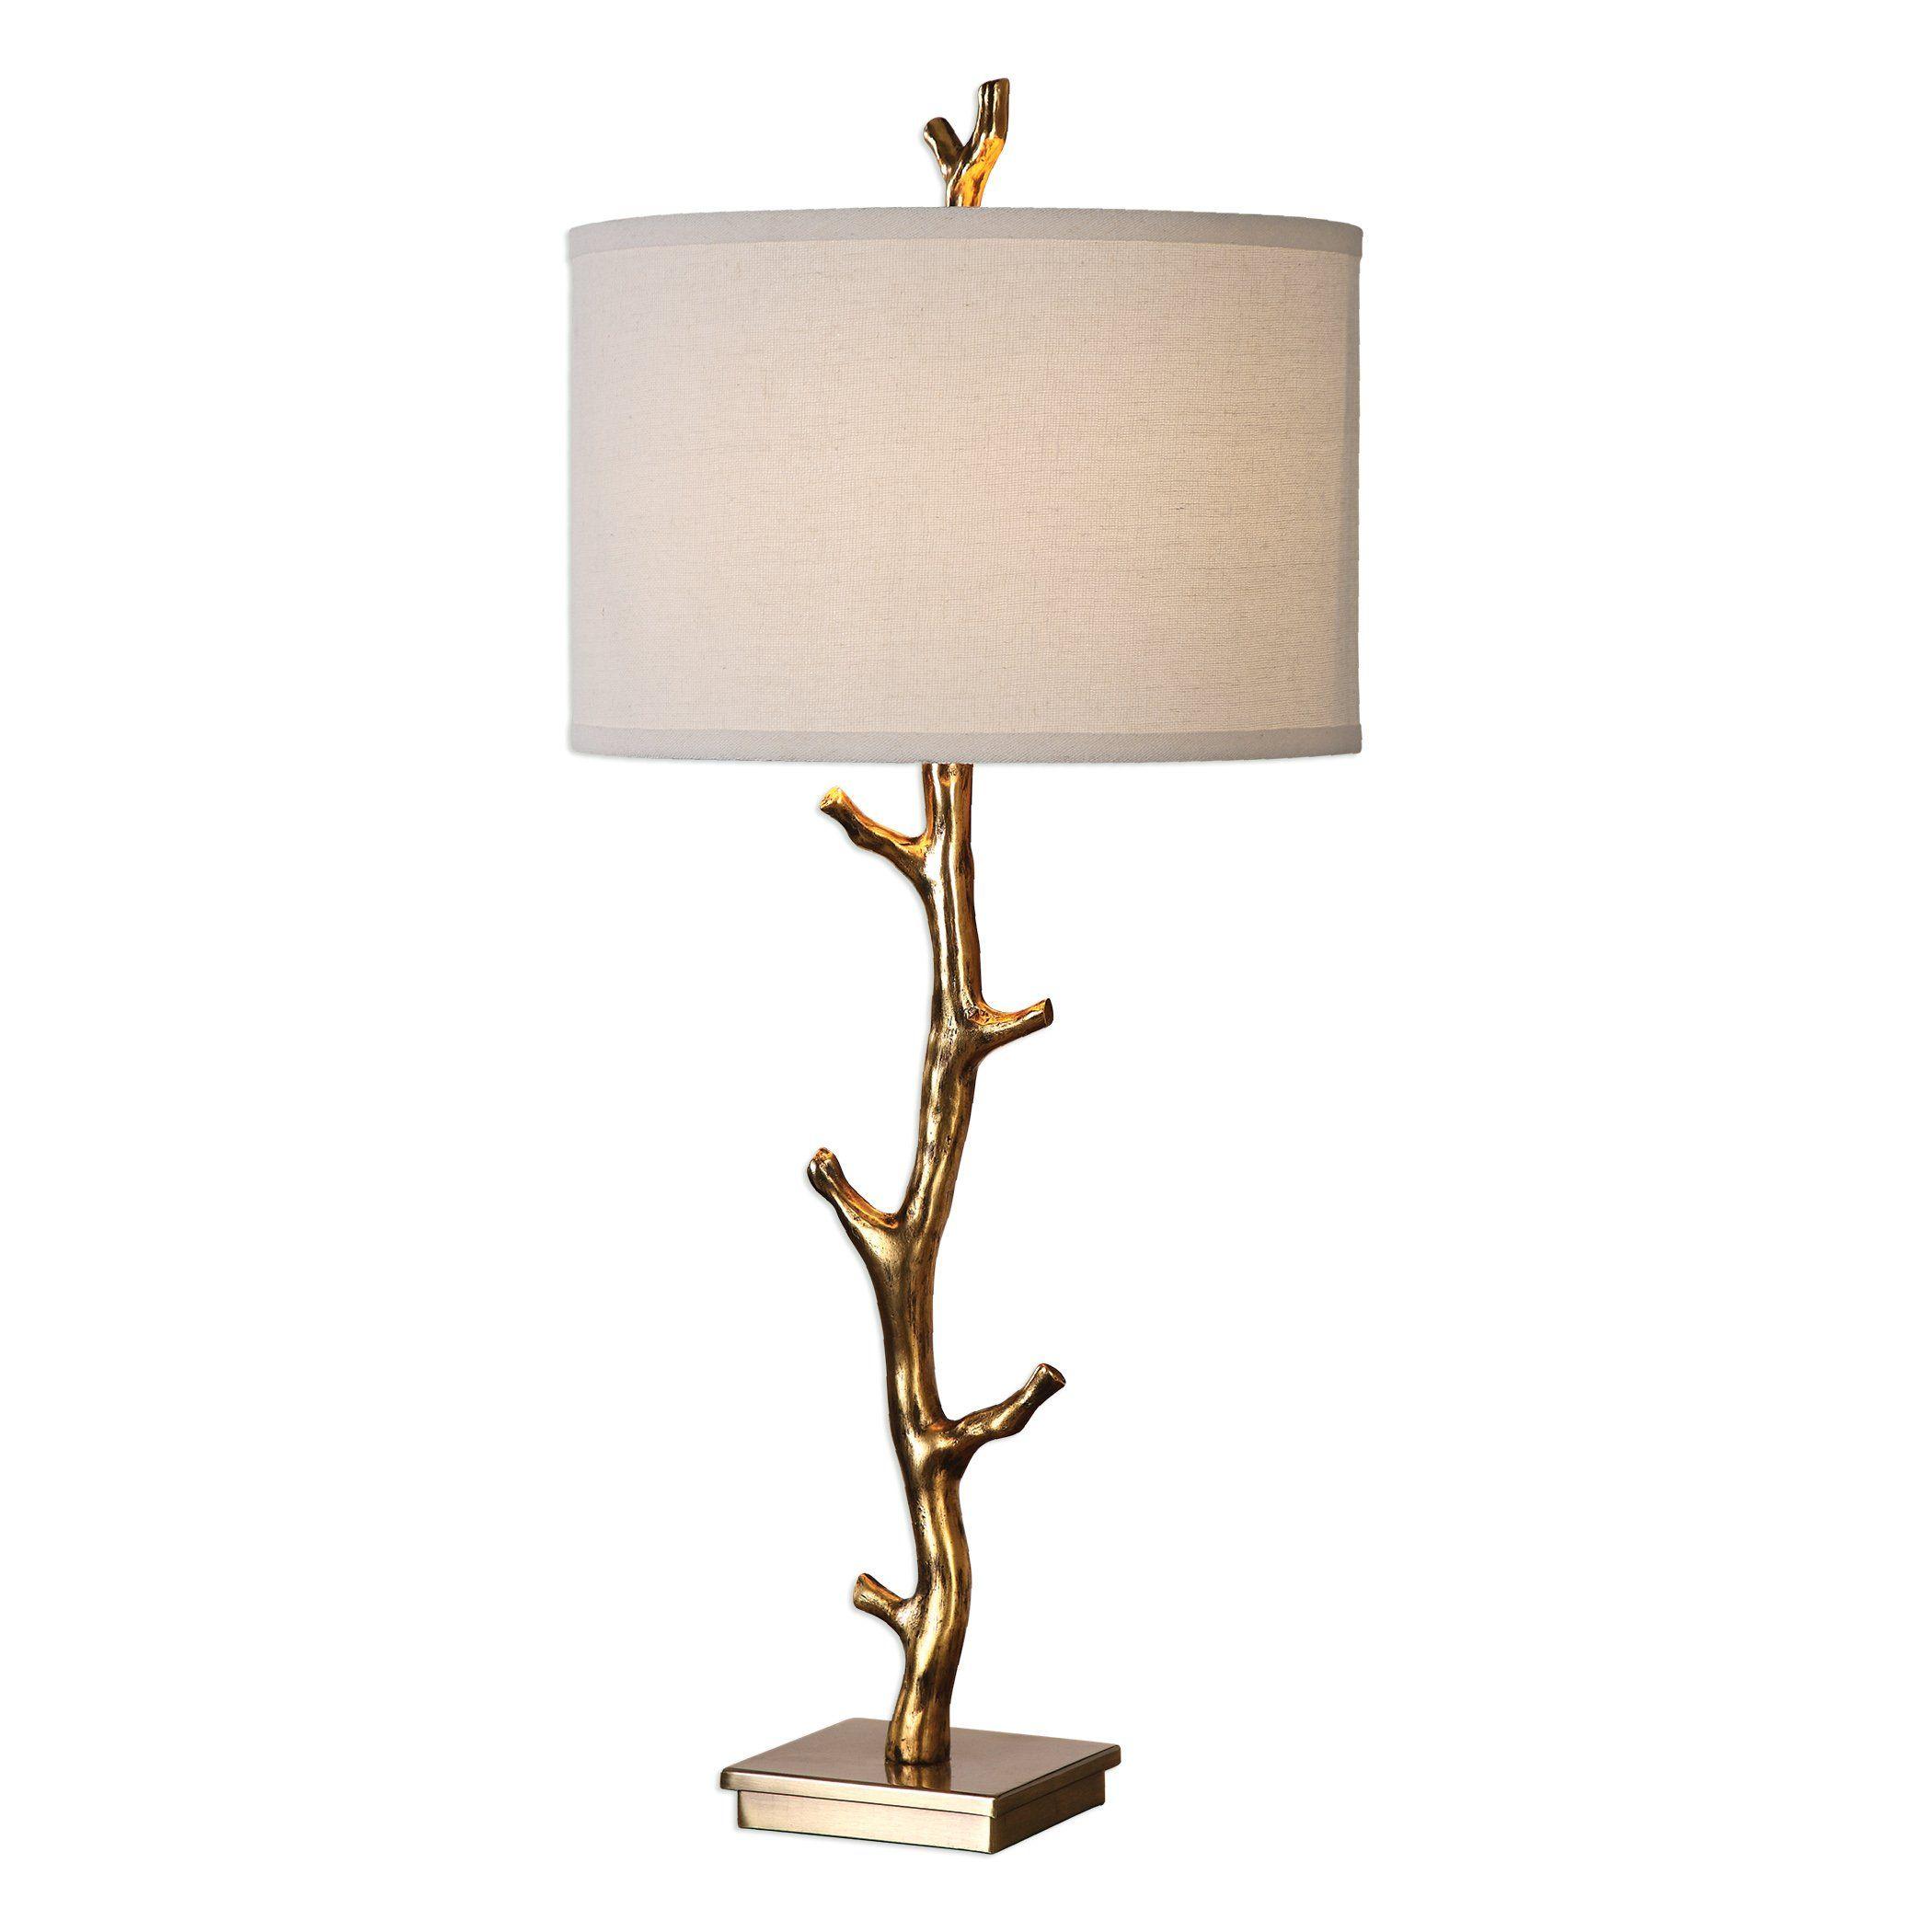 Uttermost 27546 Uttermost Javor Tree Branch Table Lamp In 2021 Gold Table Lamp Table Lamp Lamp